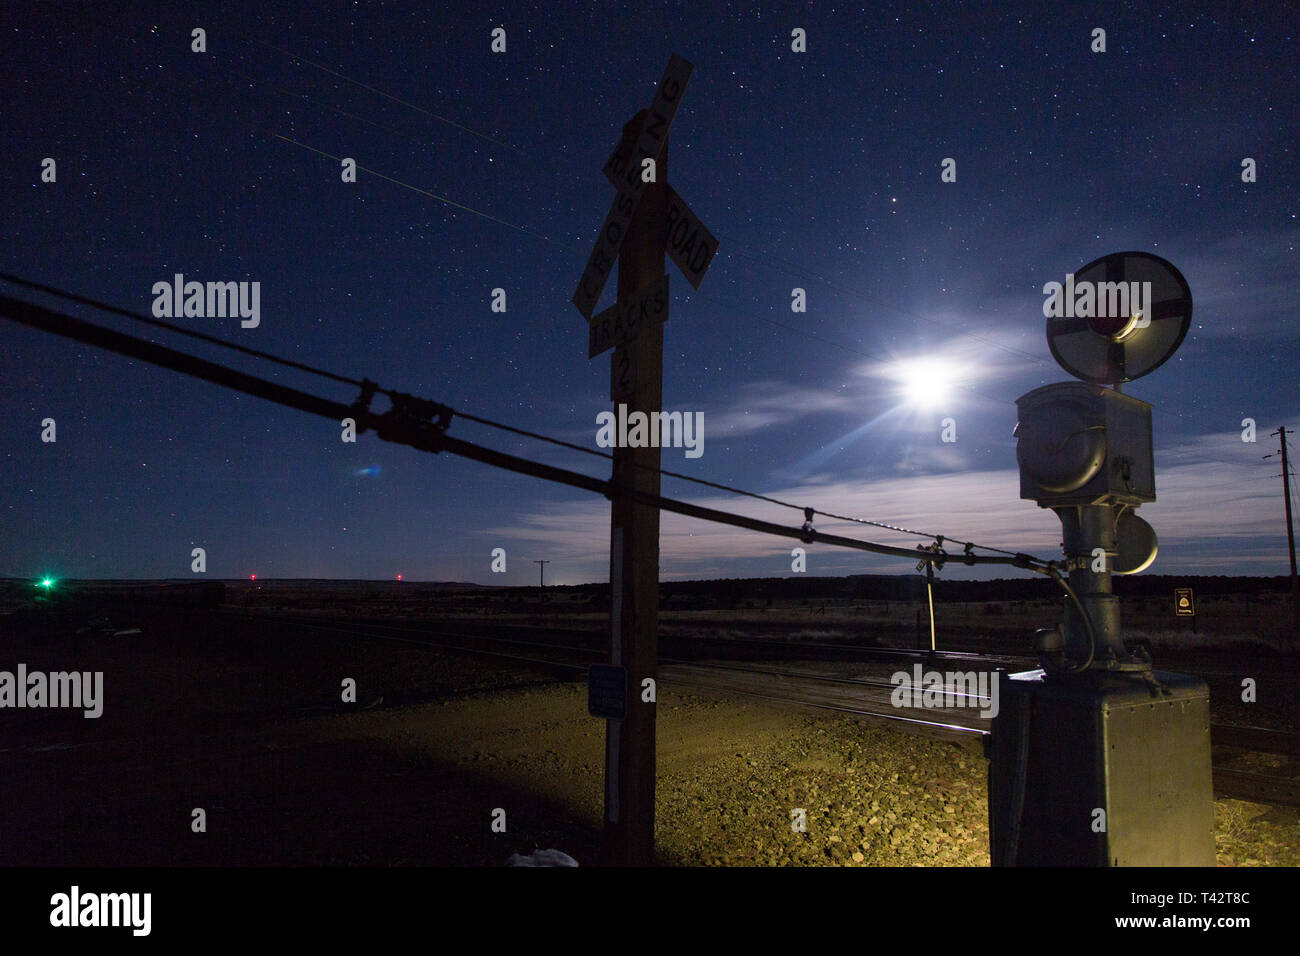 railroad crossing signal wig wag in southwestern united states delhi colorado under large night sky under moonlight along santa fe trail - Stock Image